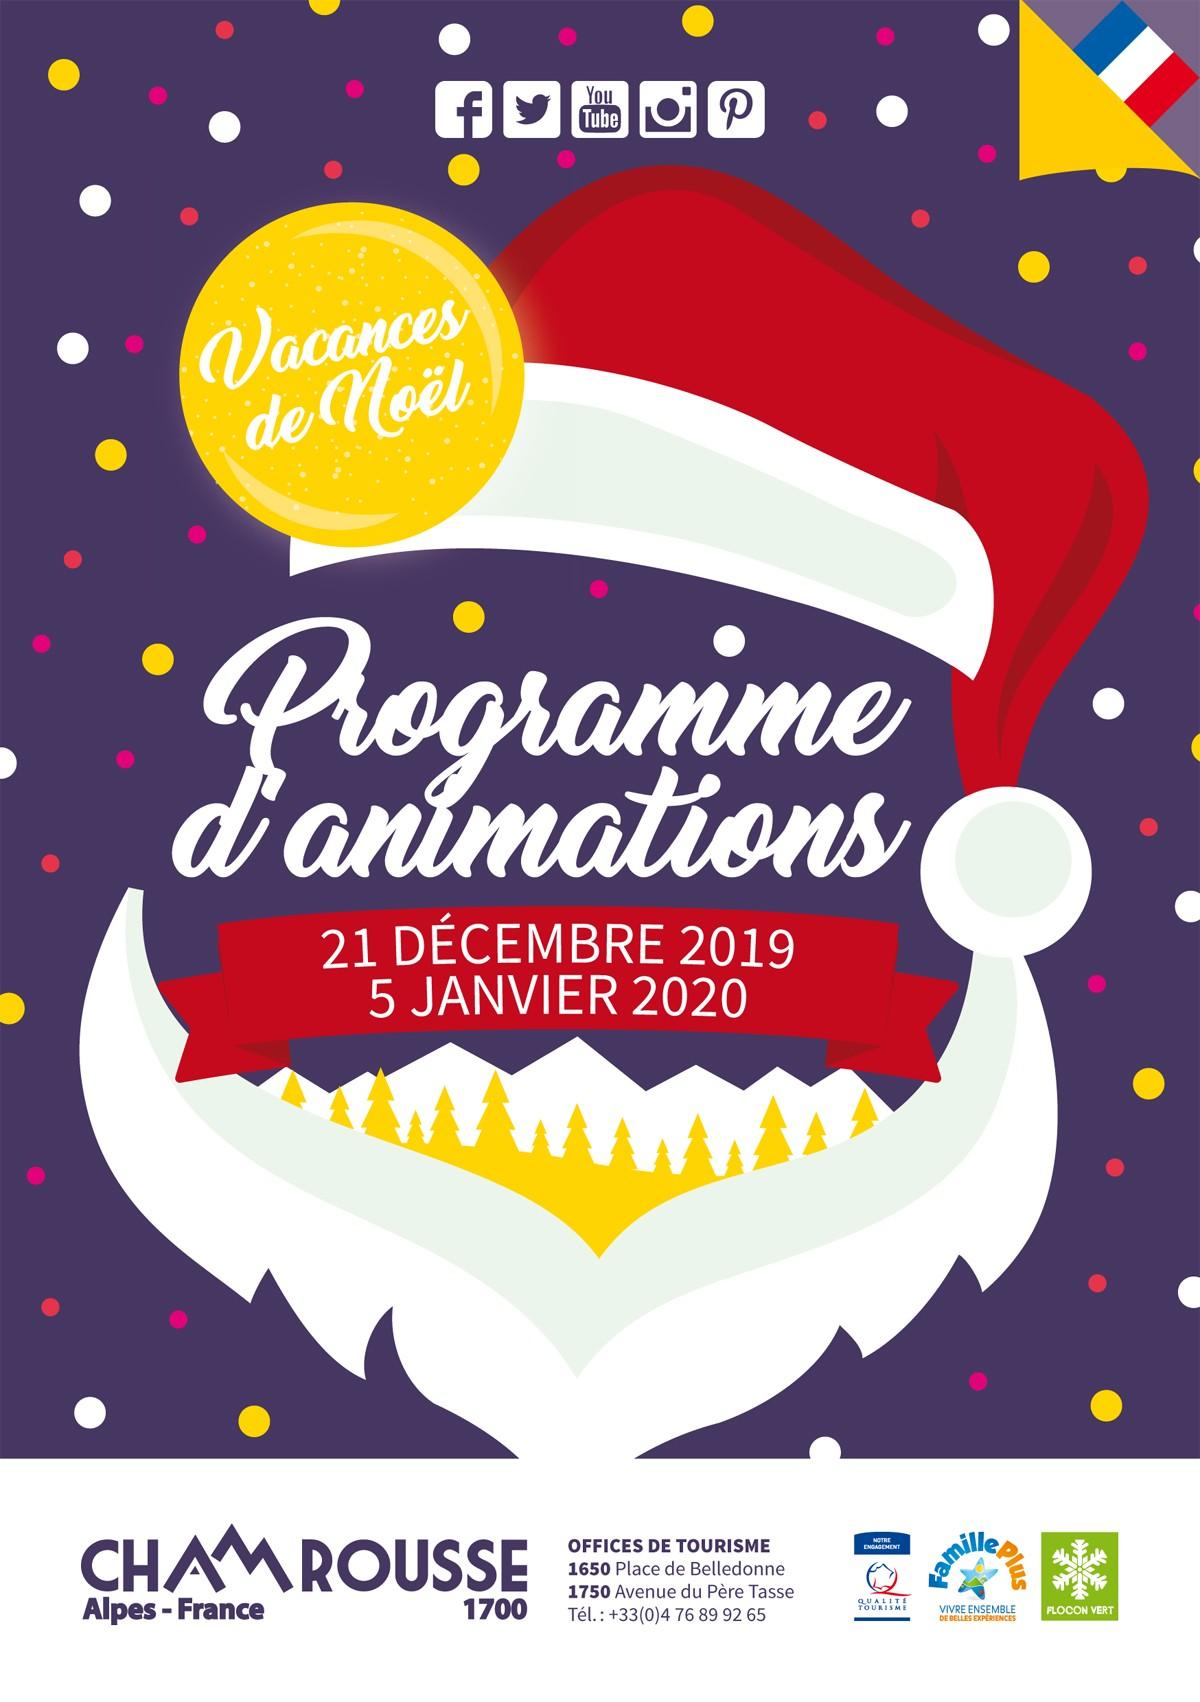 chamrousse-couverture-programme-animations-hiver-vacances-noel-2019-fr-station-ski-isere-alpes-france